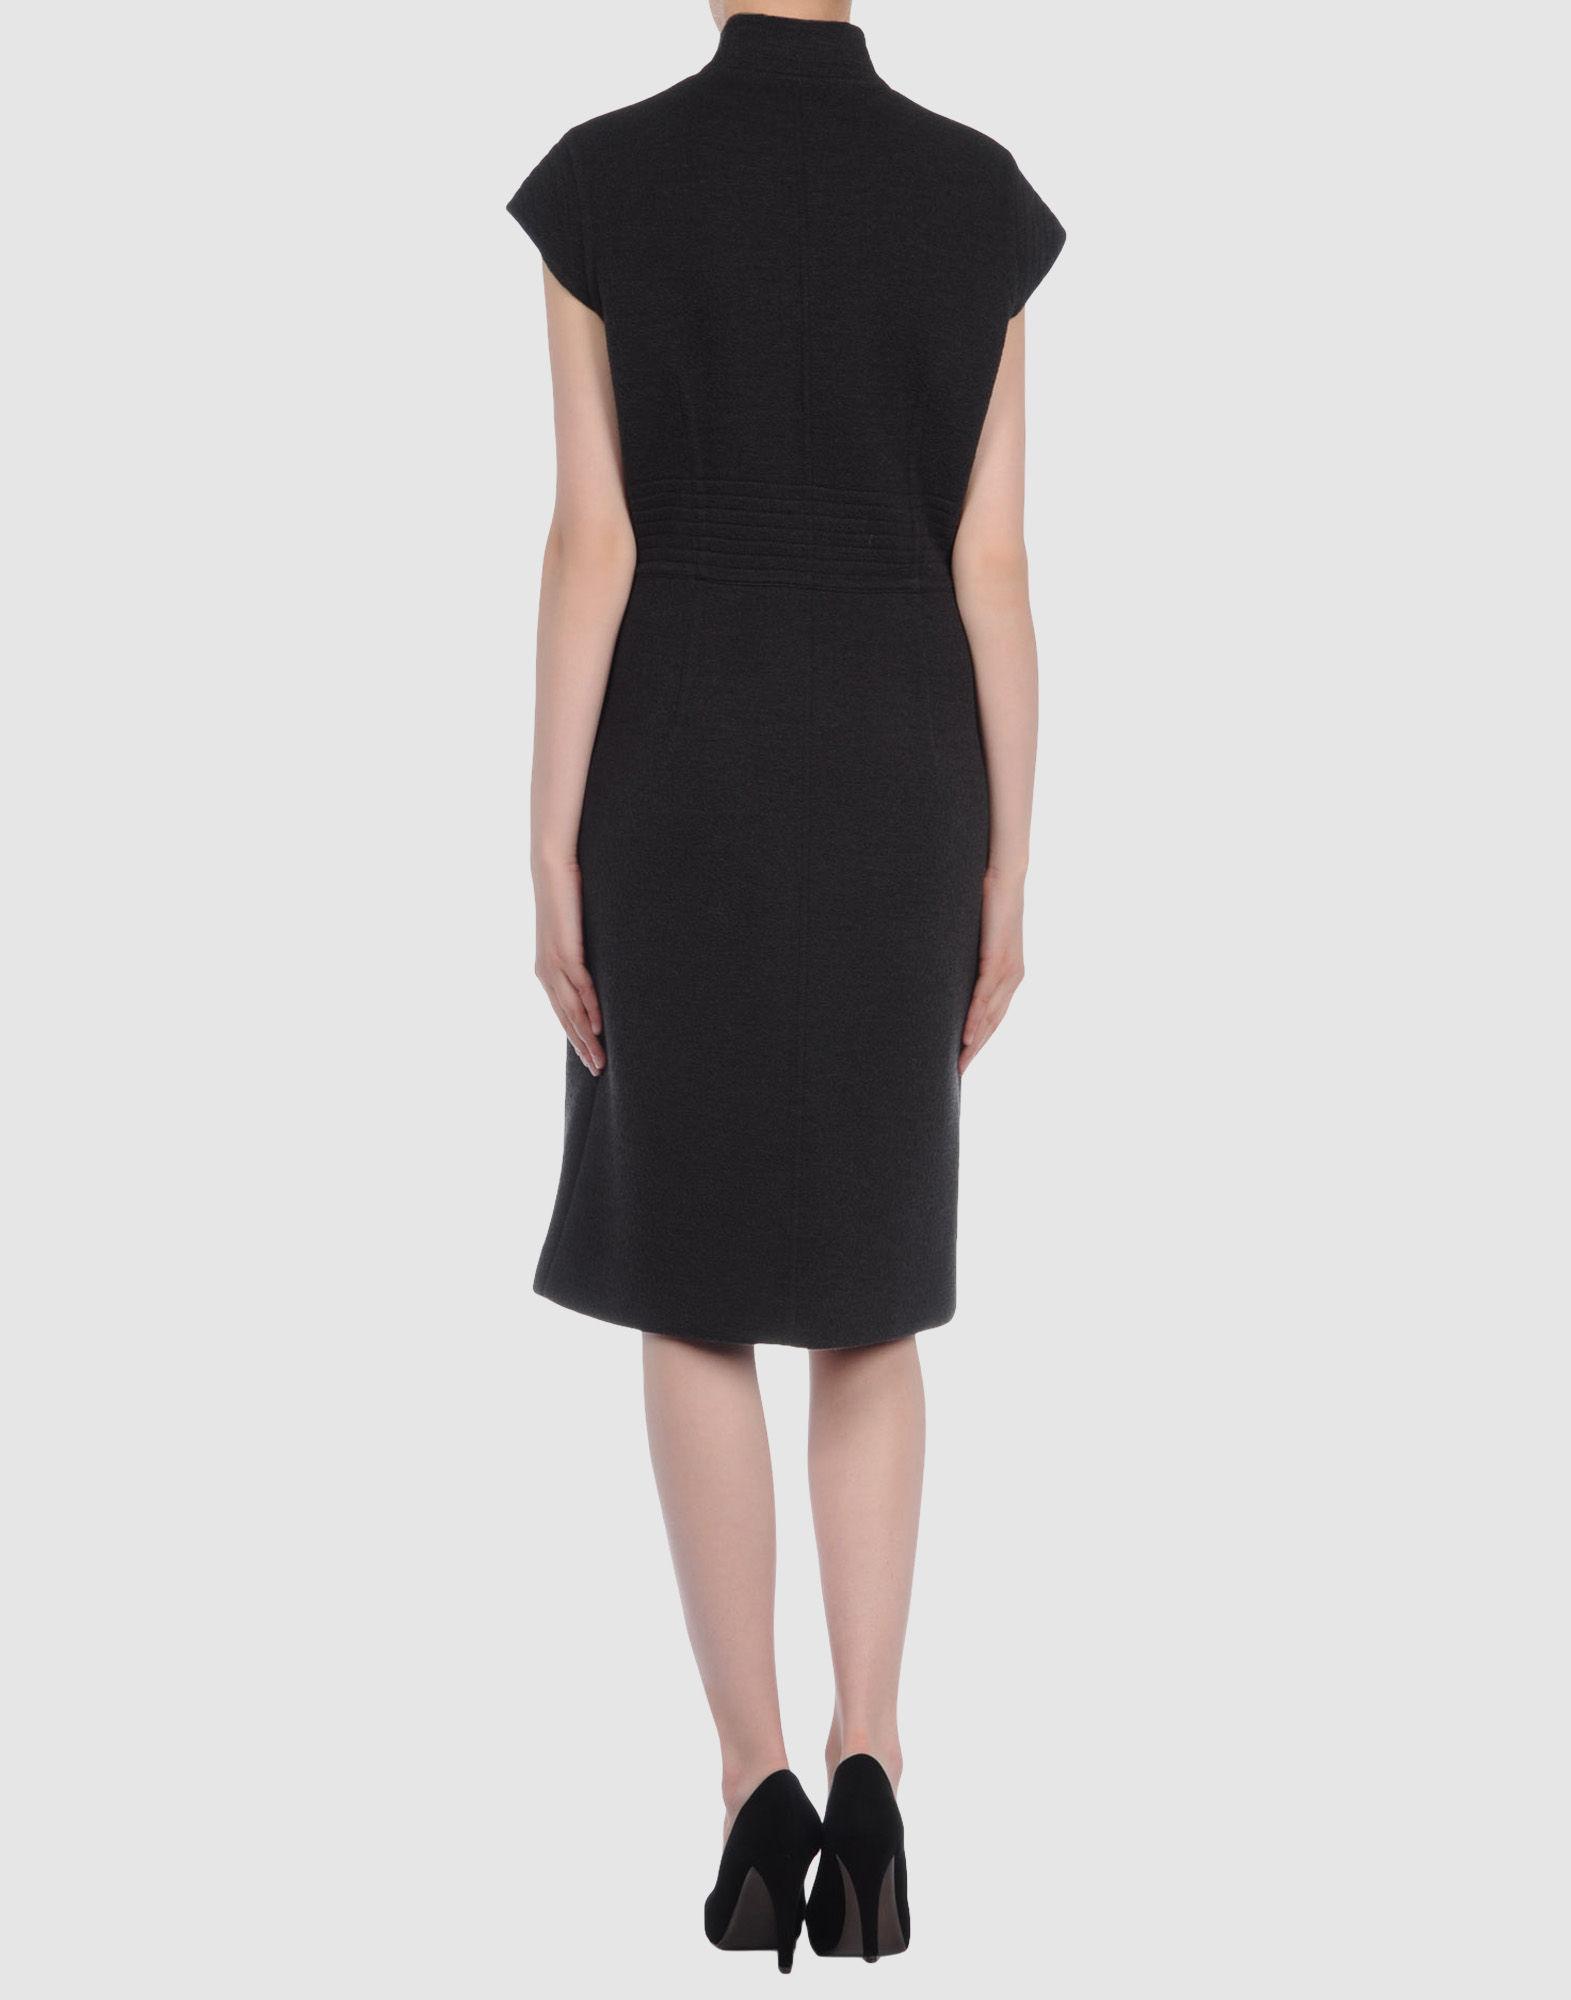 34220355RL 14 r - Βραδυνα Φορεματα Yves Saint Laurent Rive Gauche Κωδ.50